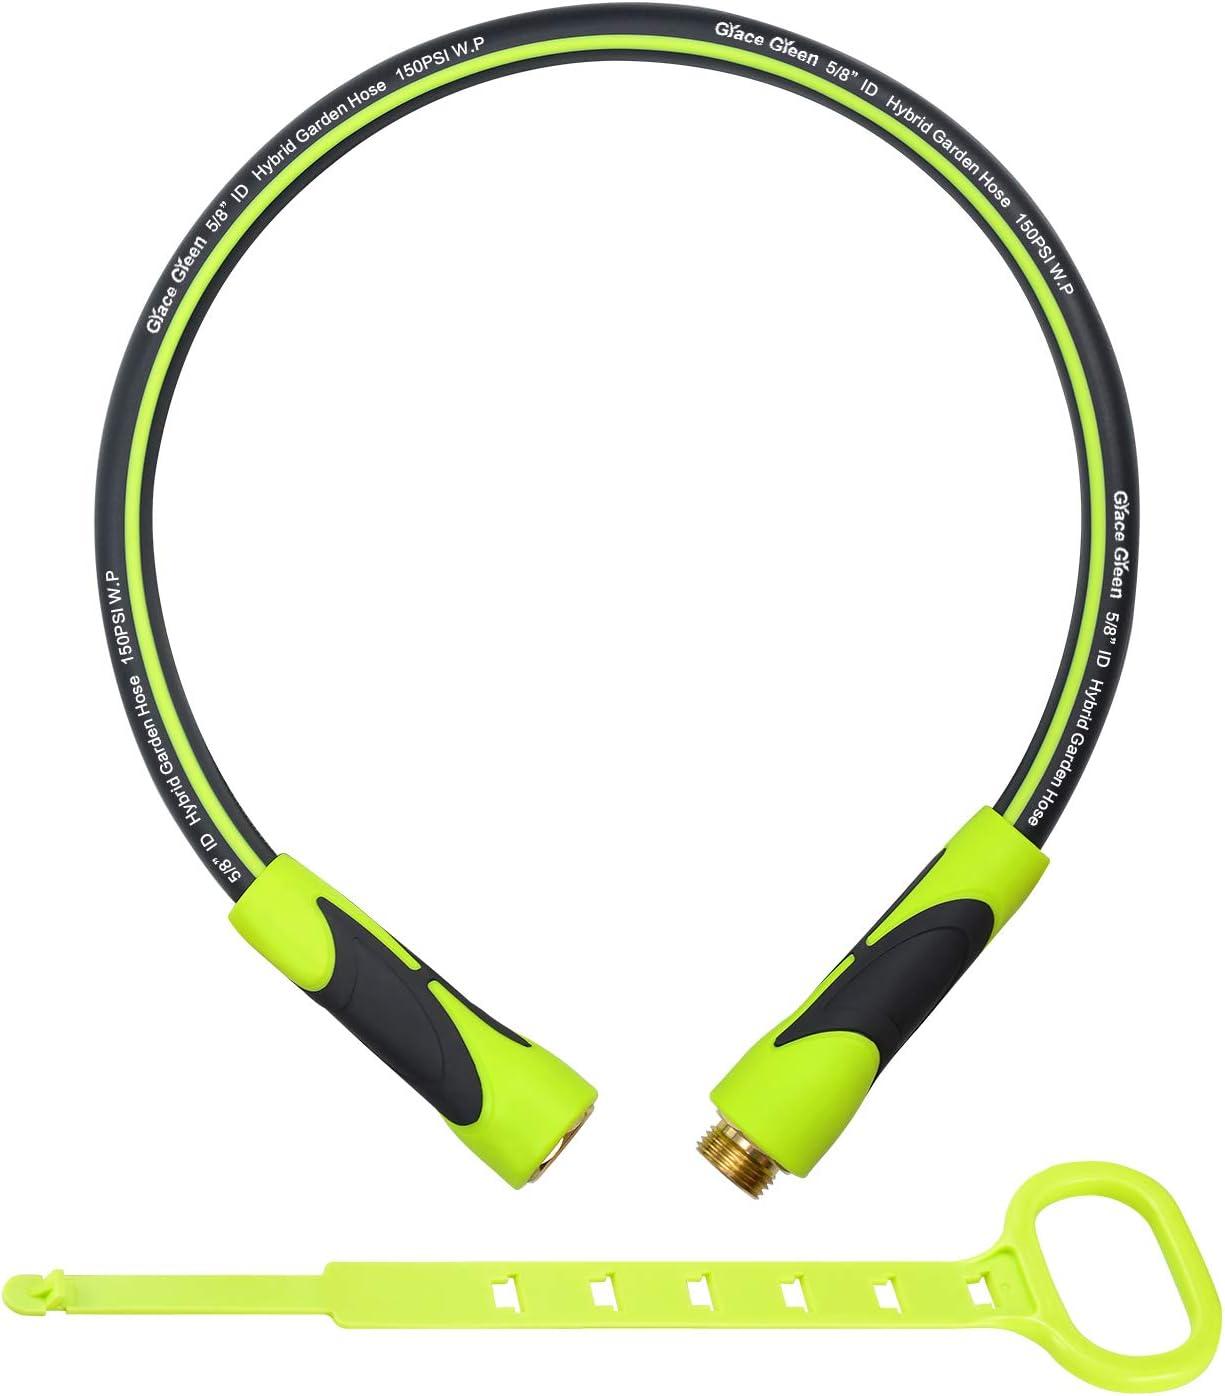 Grace Green Lead in Hose,Hybrid 5/8 in.×3FT Short Garden Hose, Extension Hose, Both End SwivelGrip, Heavy Duty, Light Weight, Flexible